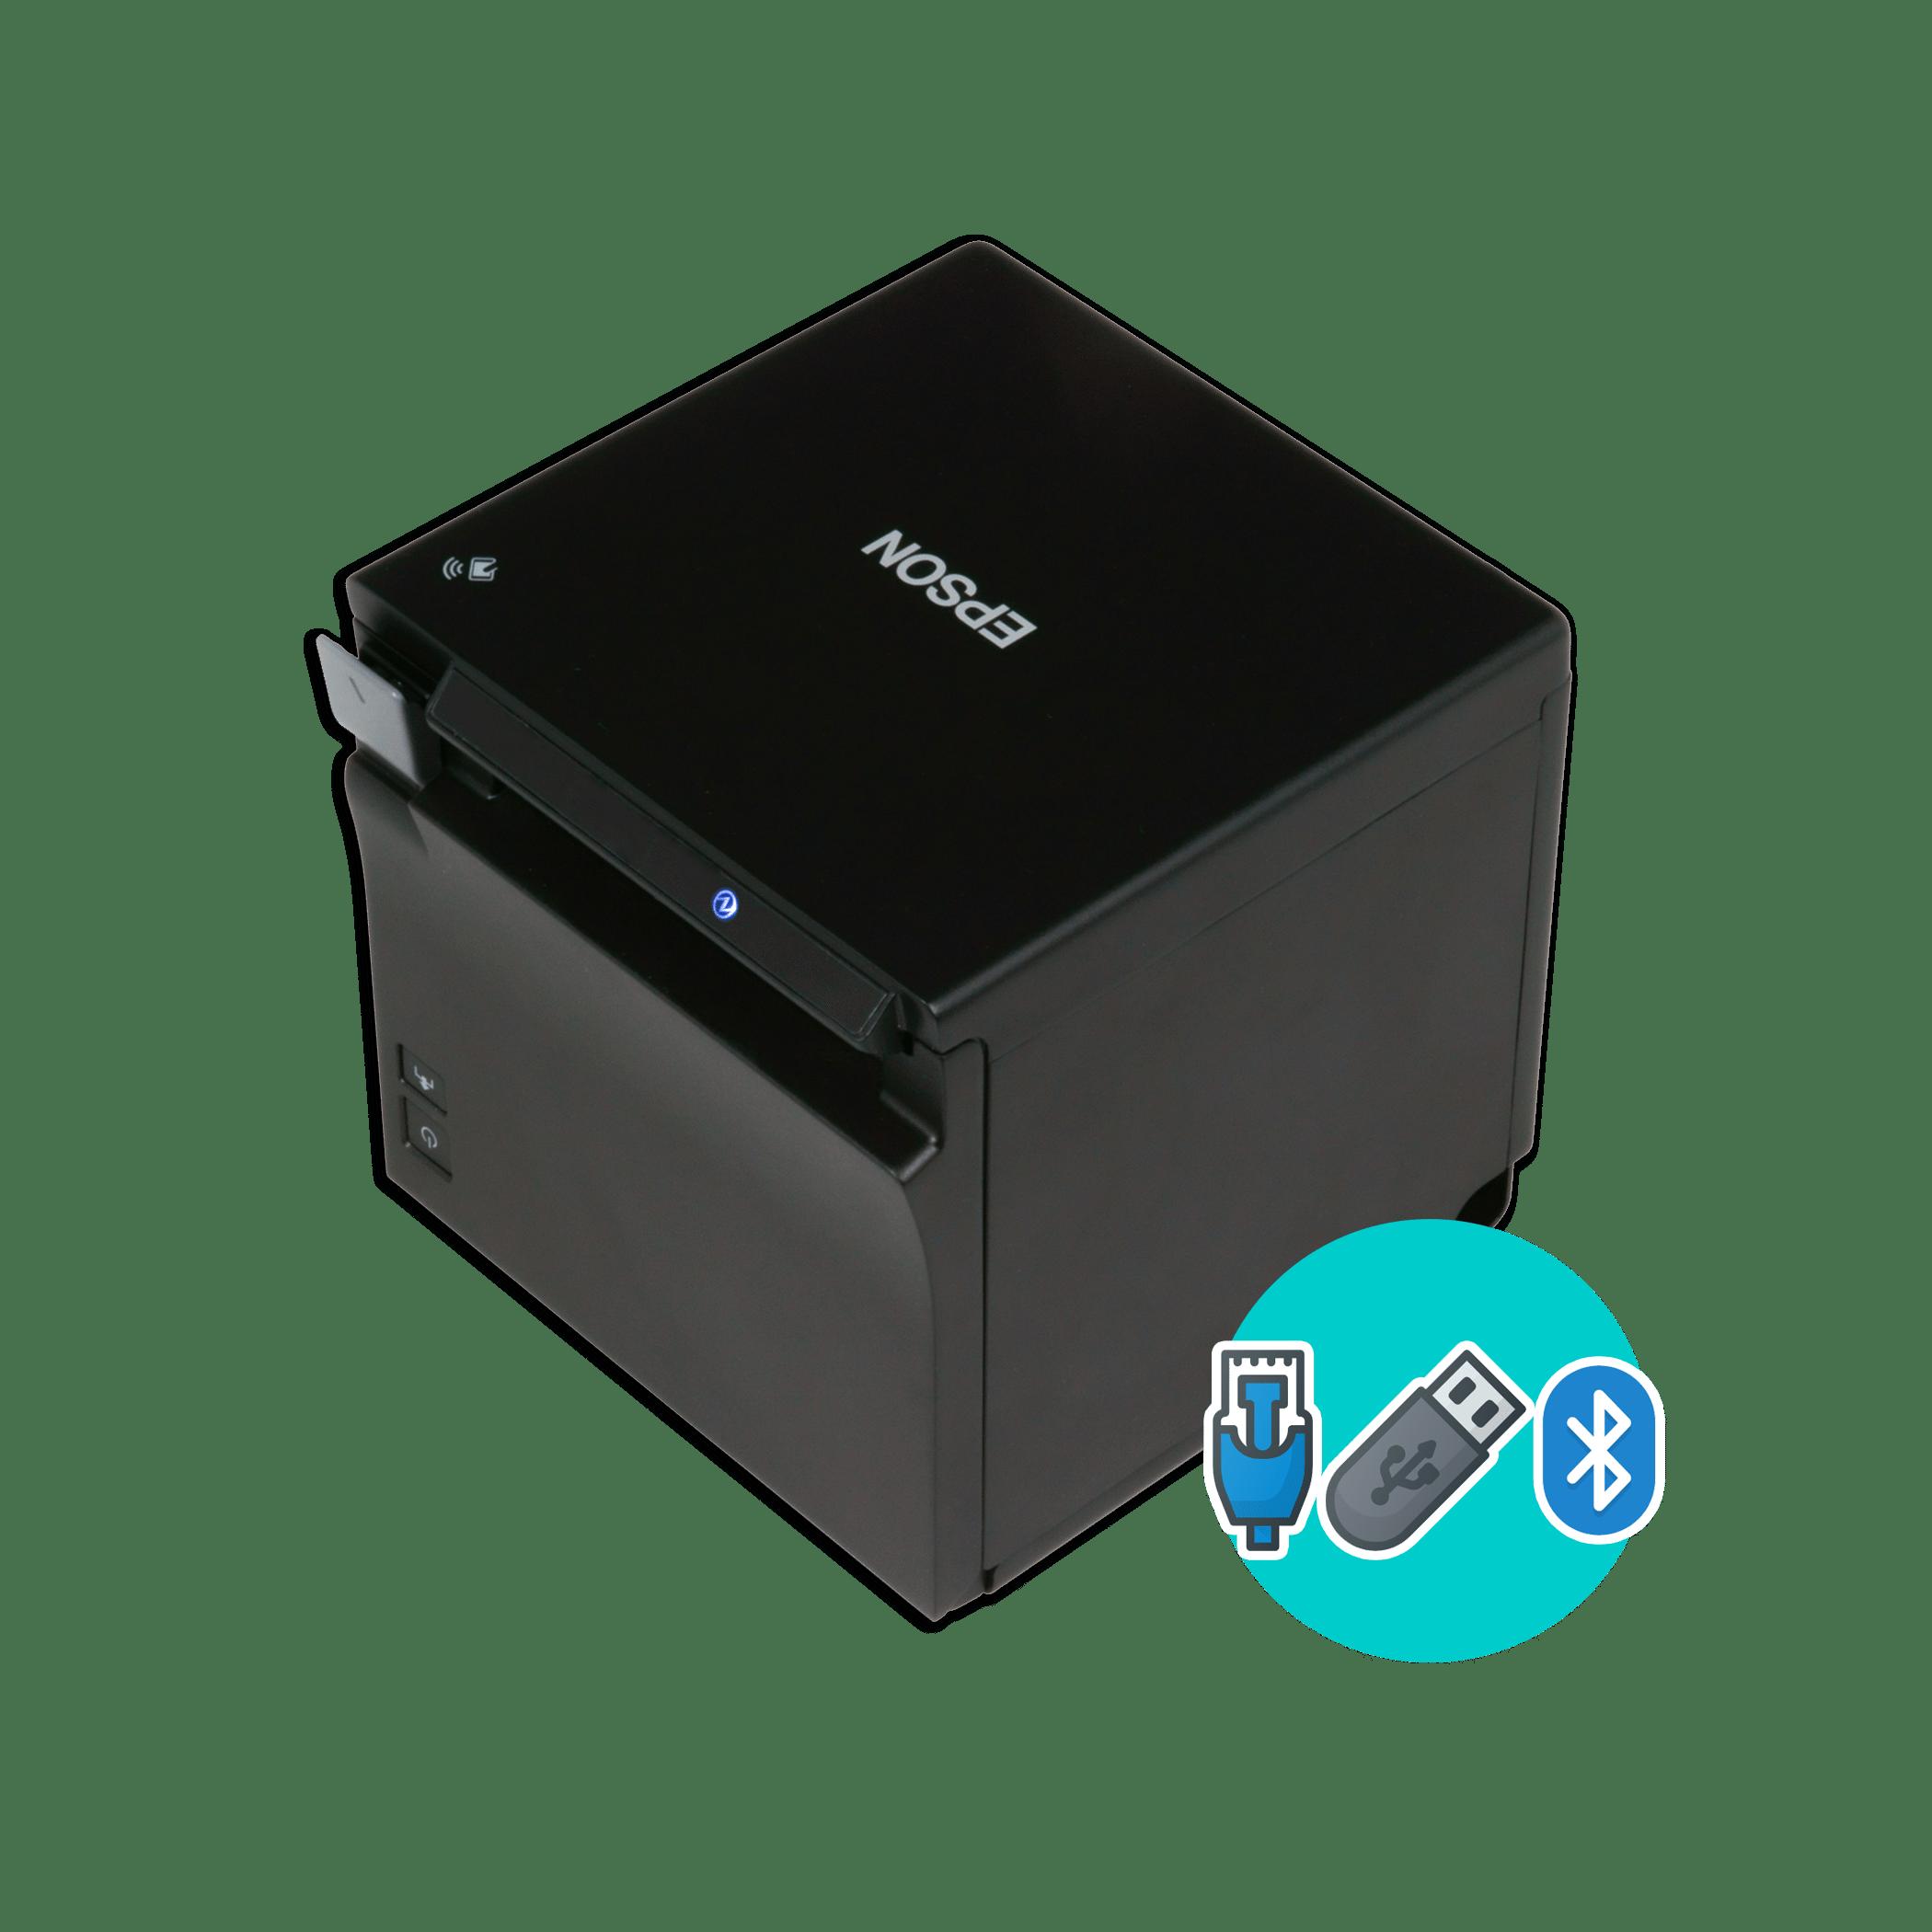 EPSON-M30-COMBO-PRINTER